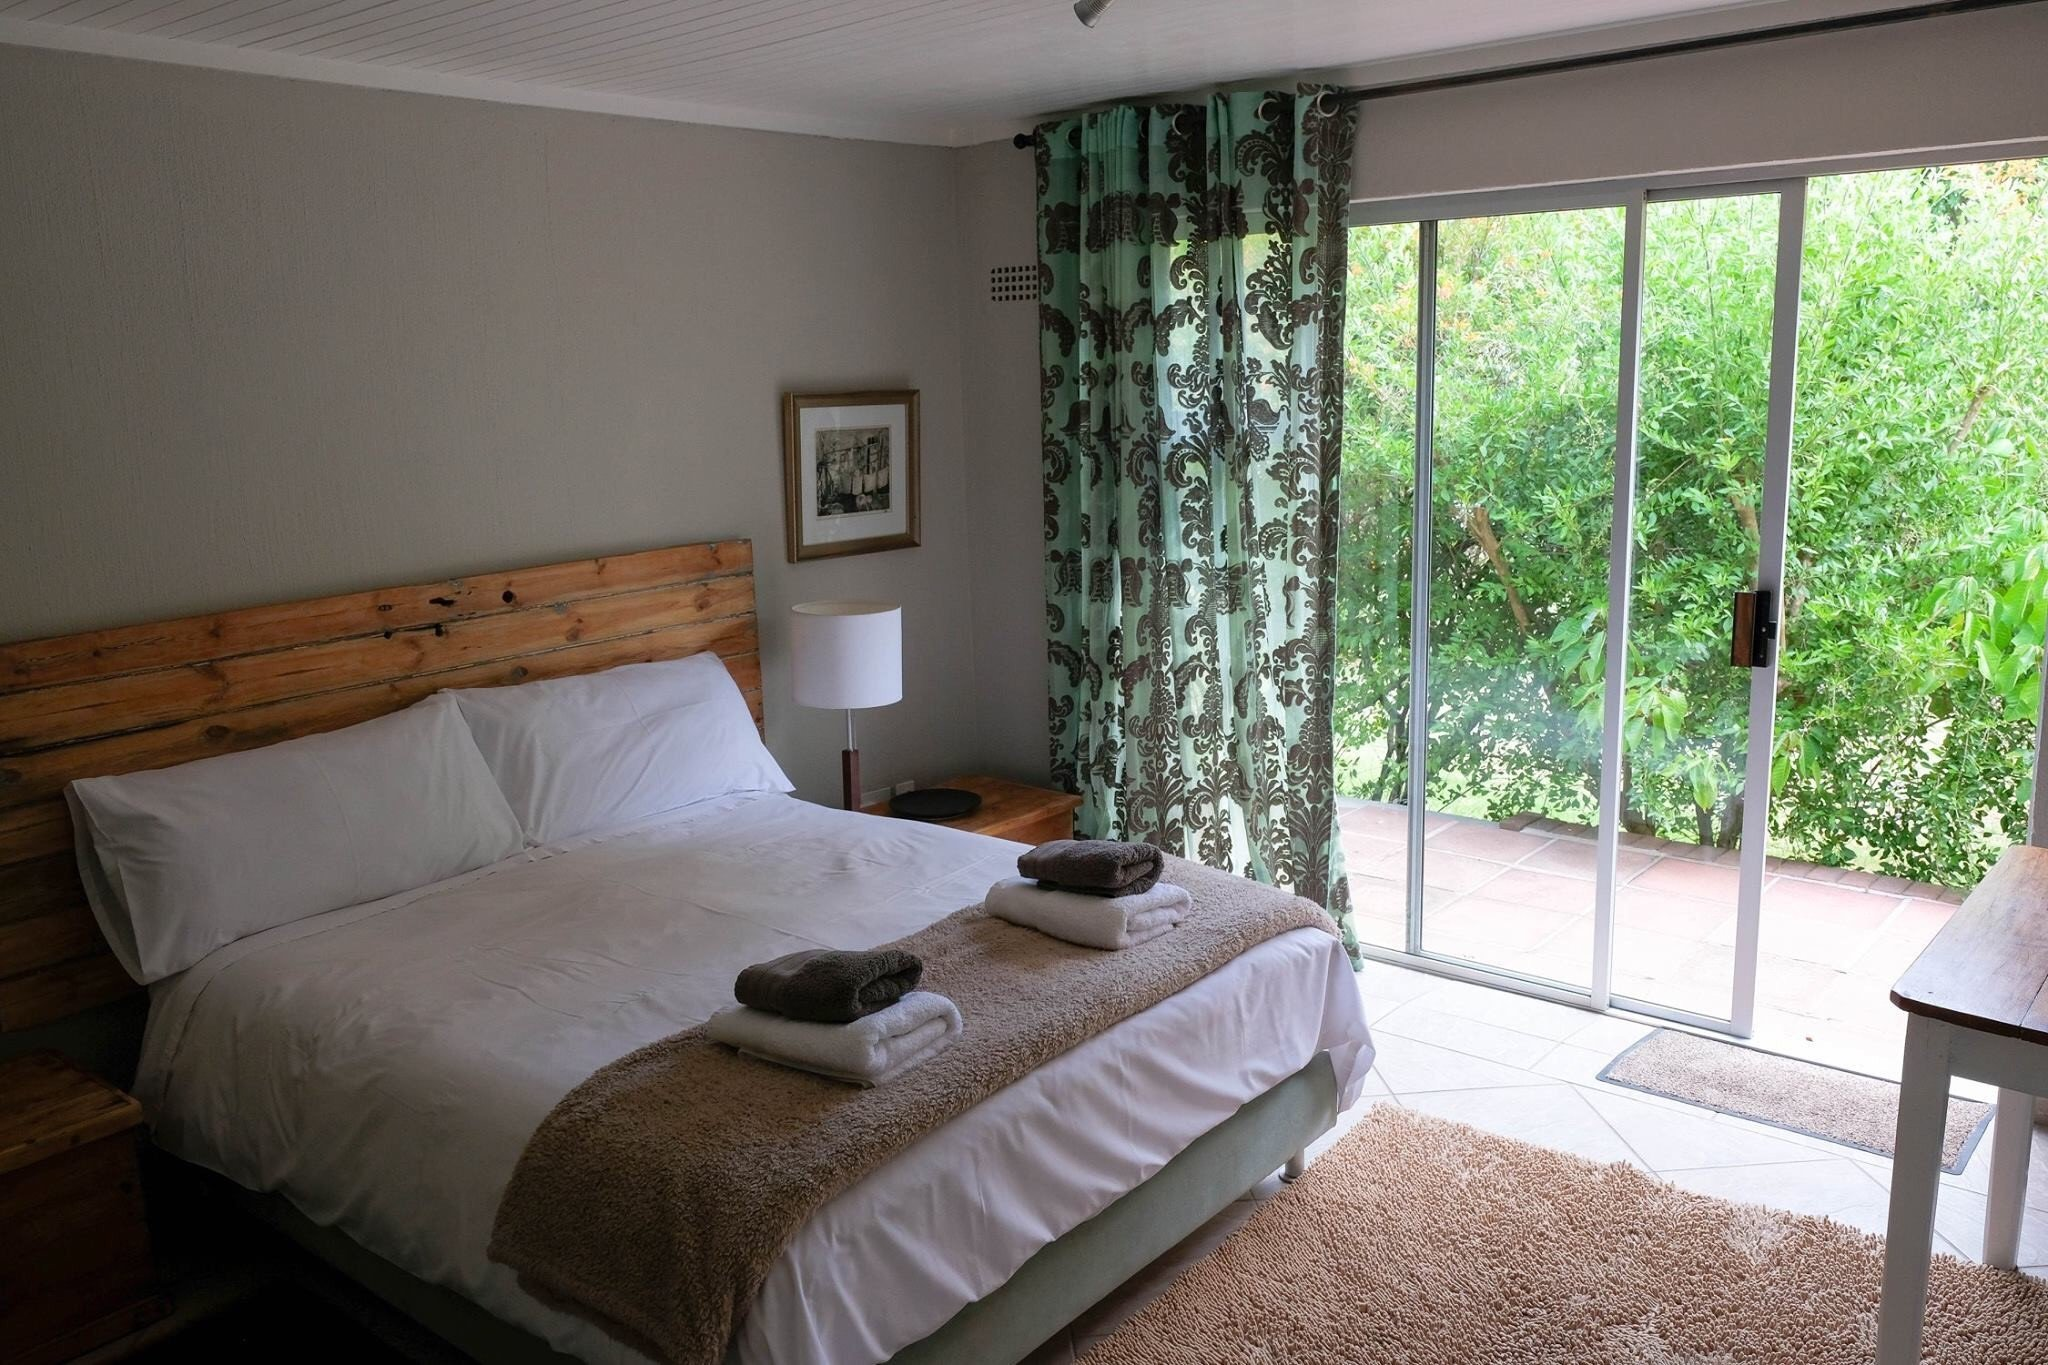 SWE Intaka Room